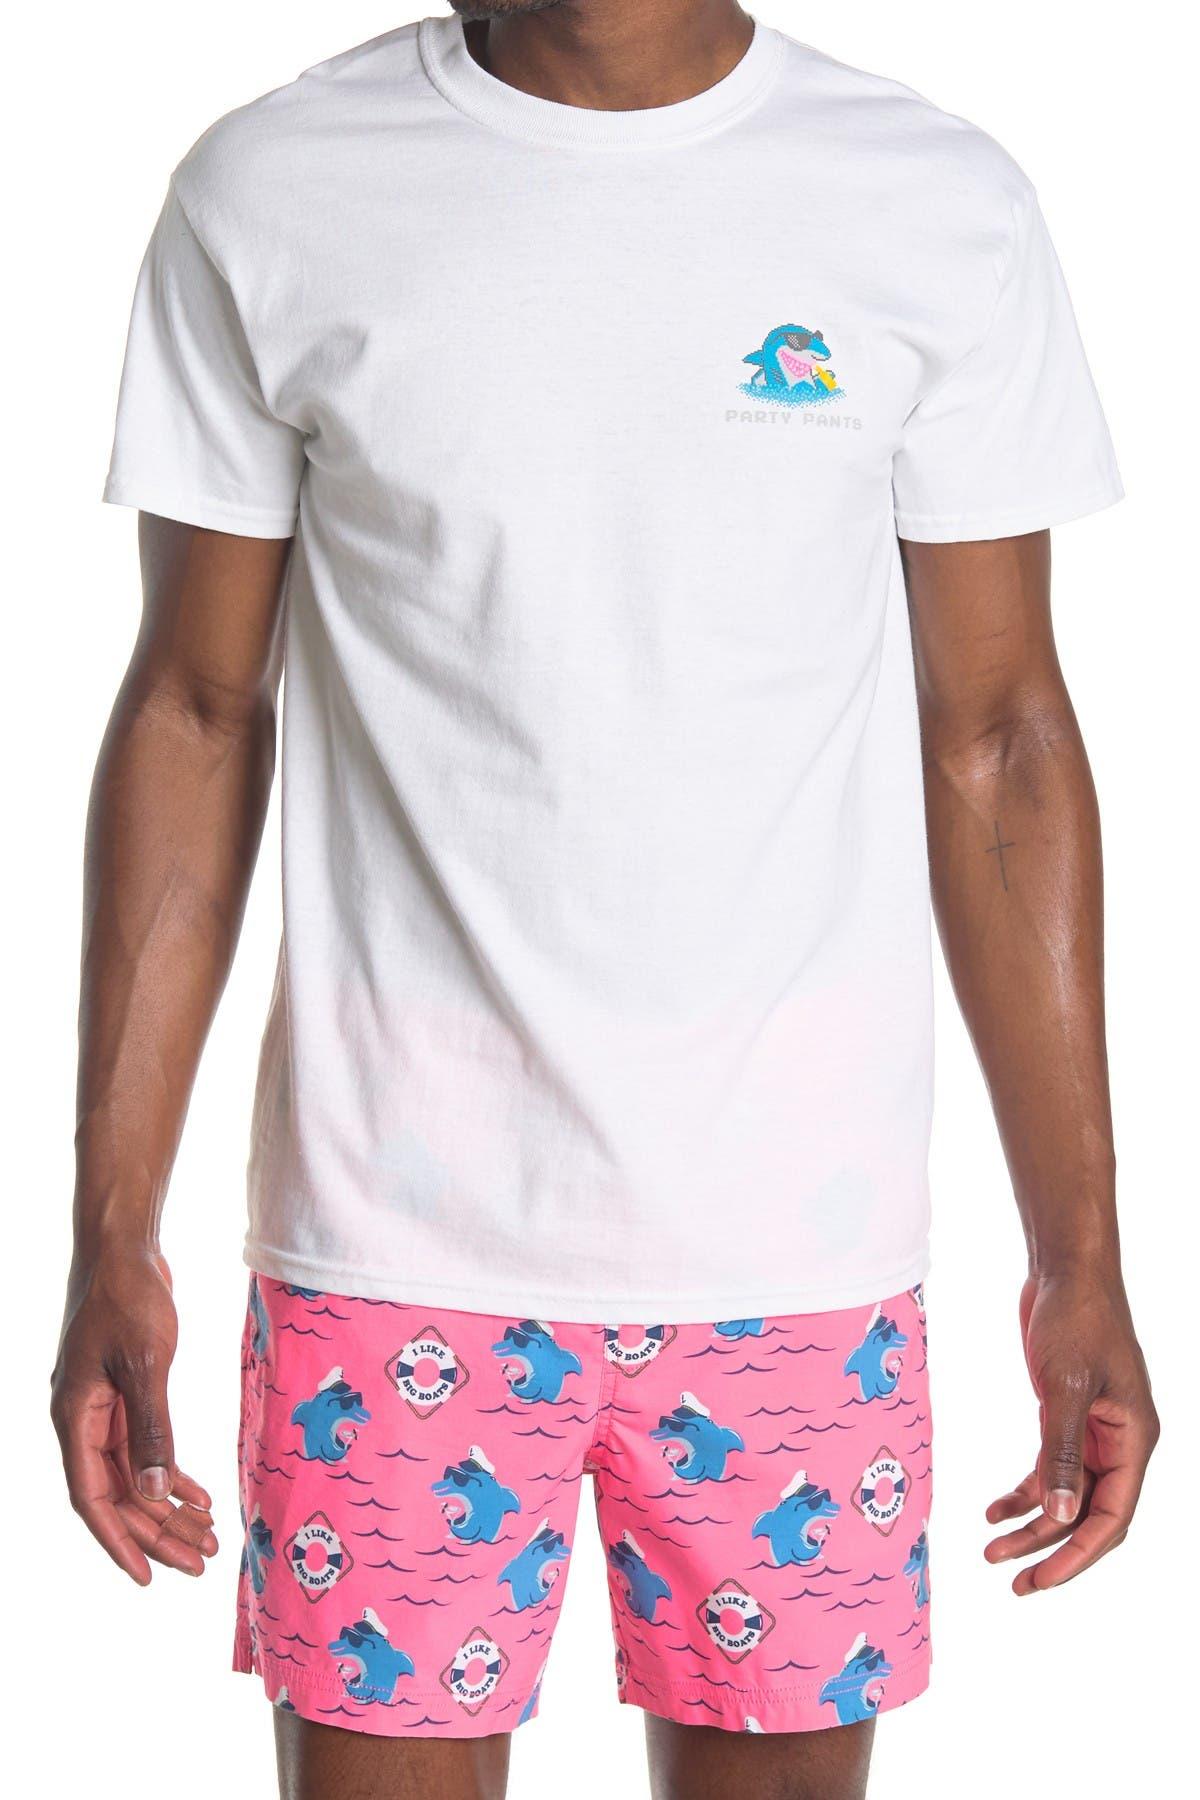 Image of PARTY PANTS Cooler Shark Short Sleeve T-Shirt